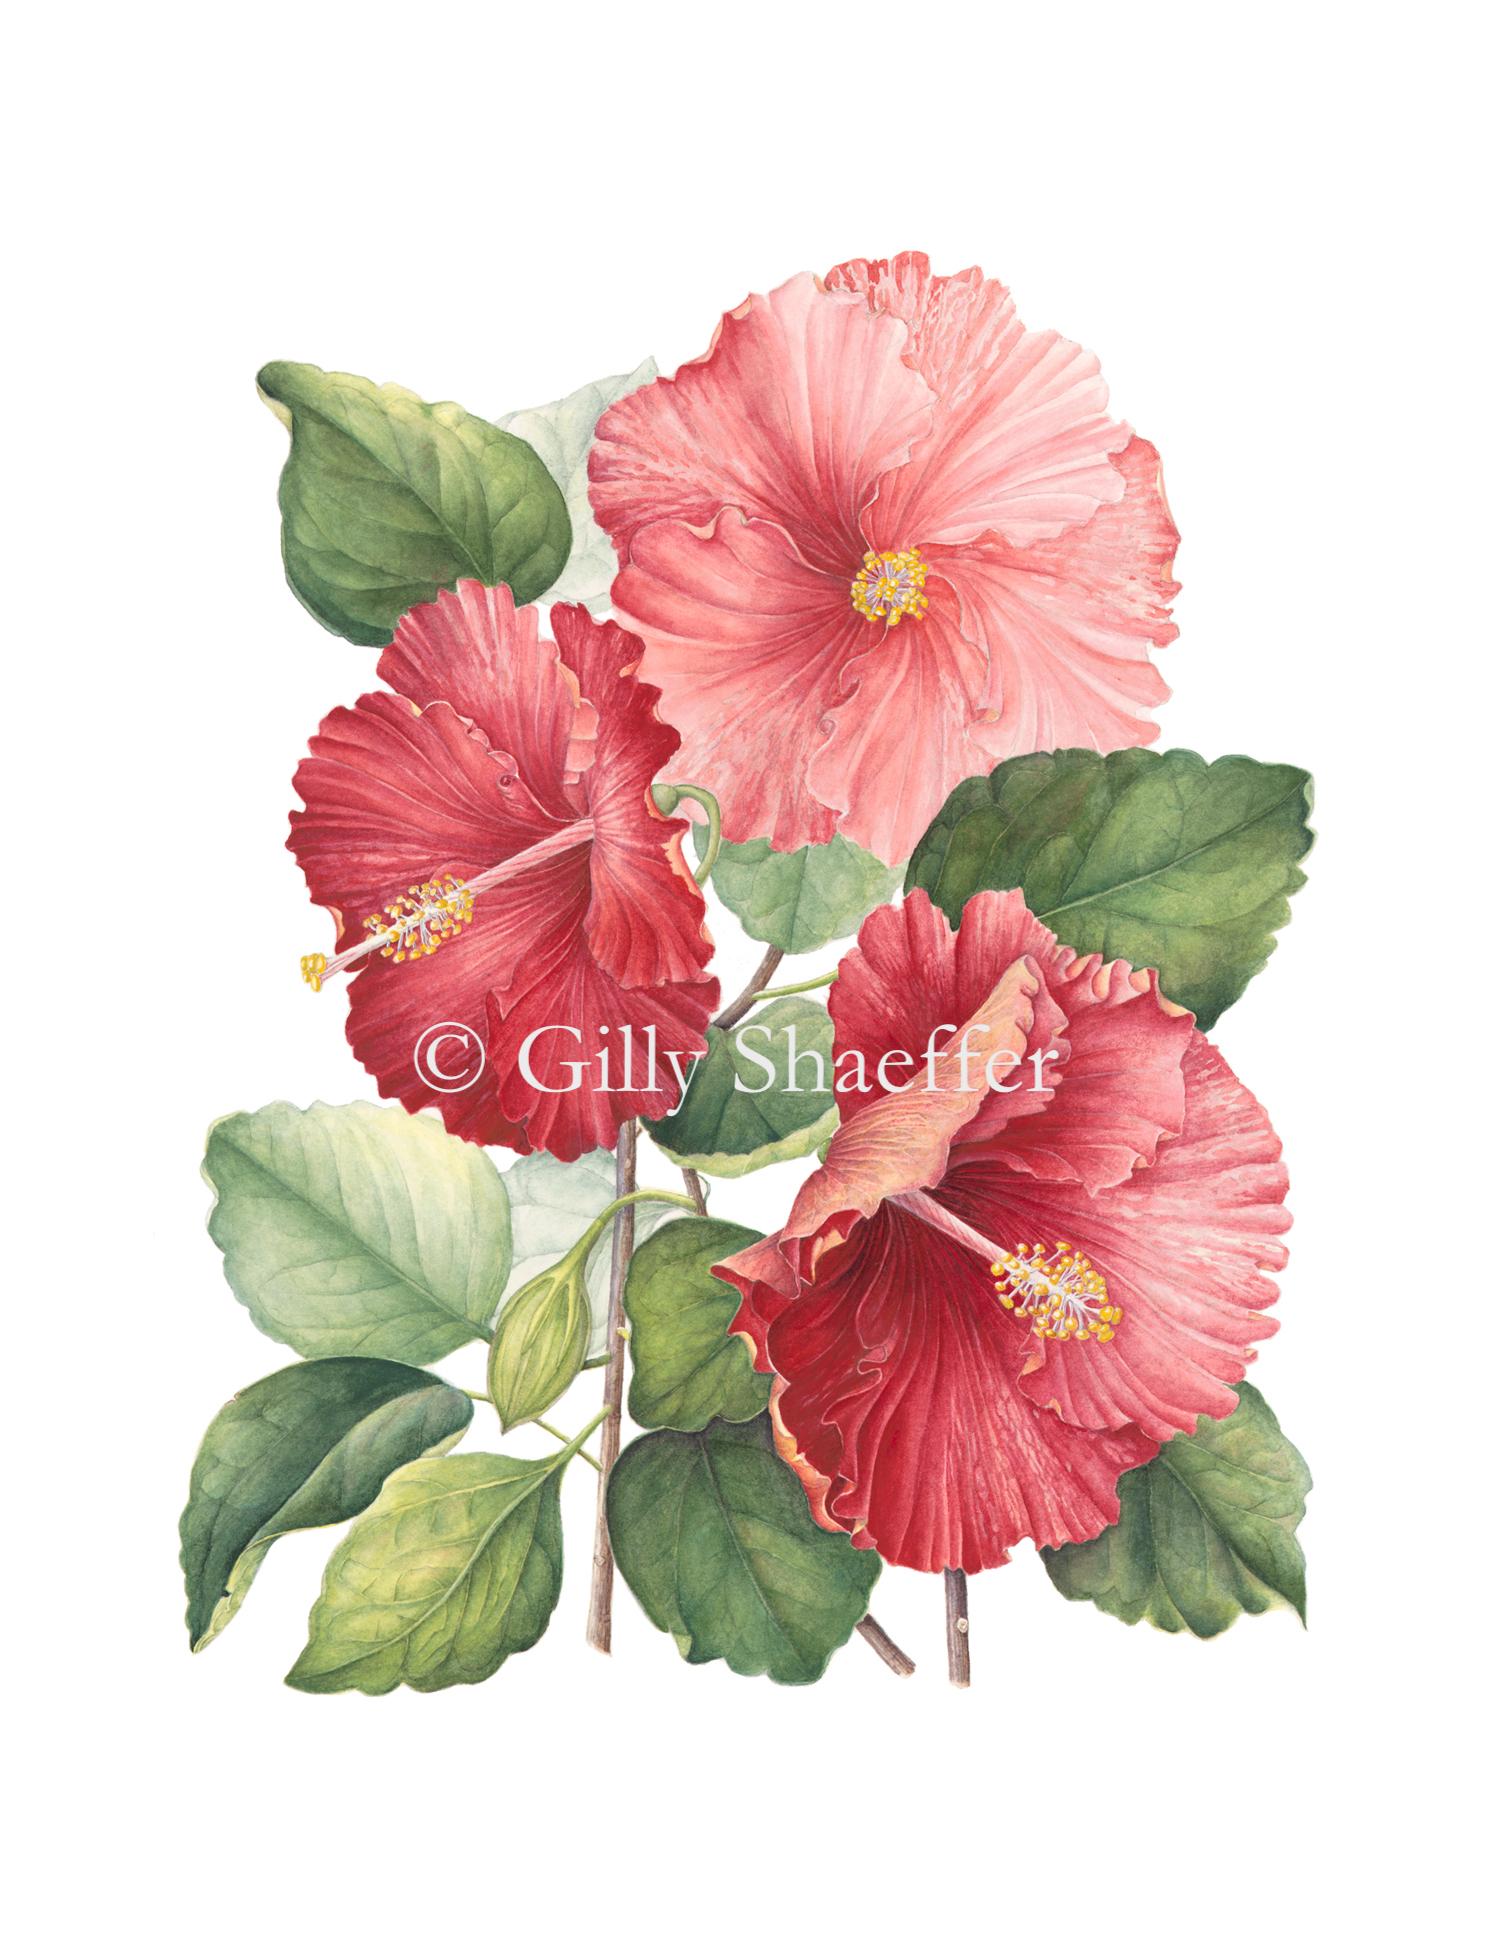 3-hibiscus copy.jpg